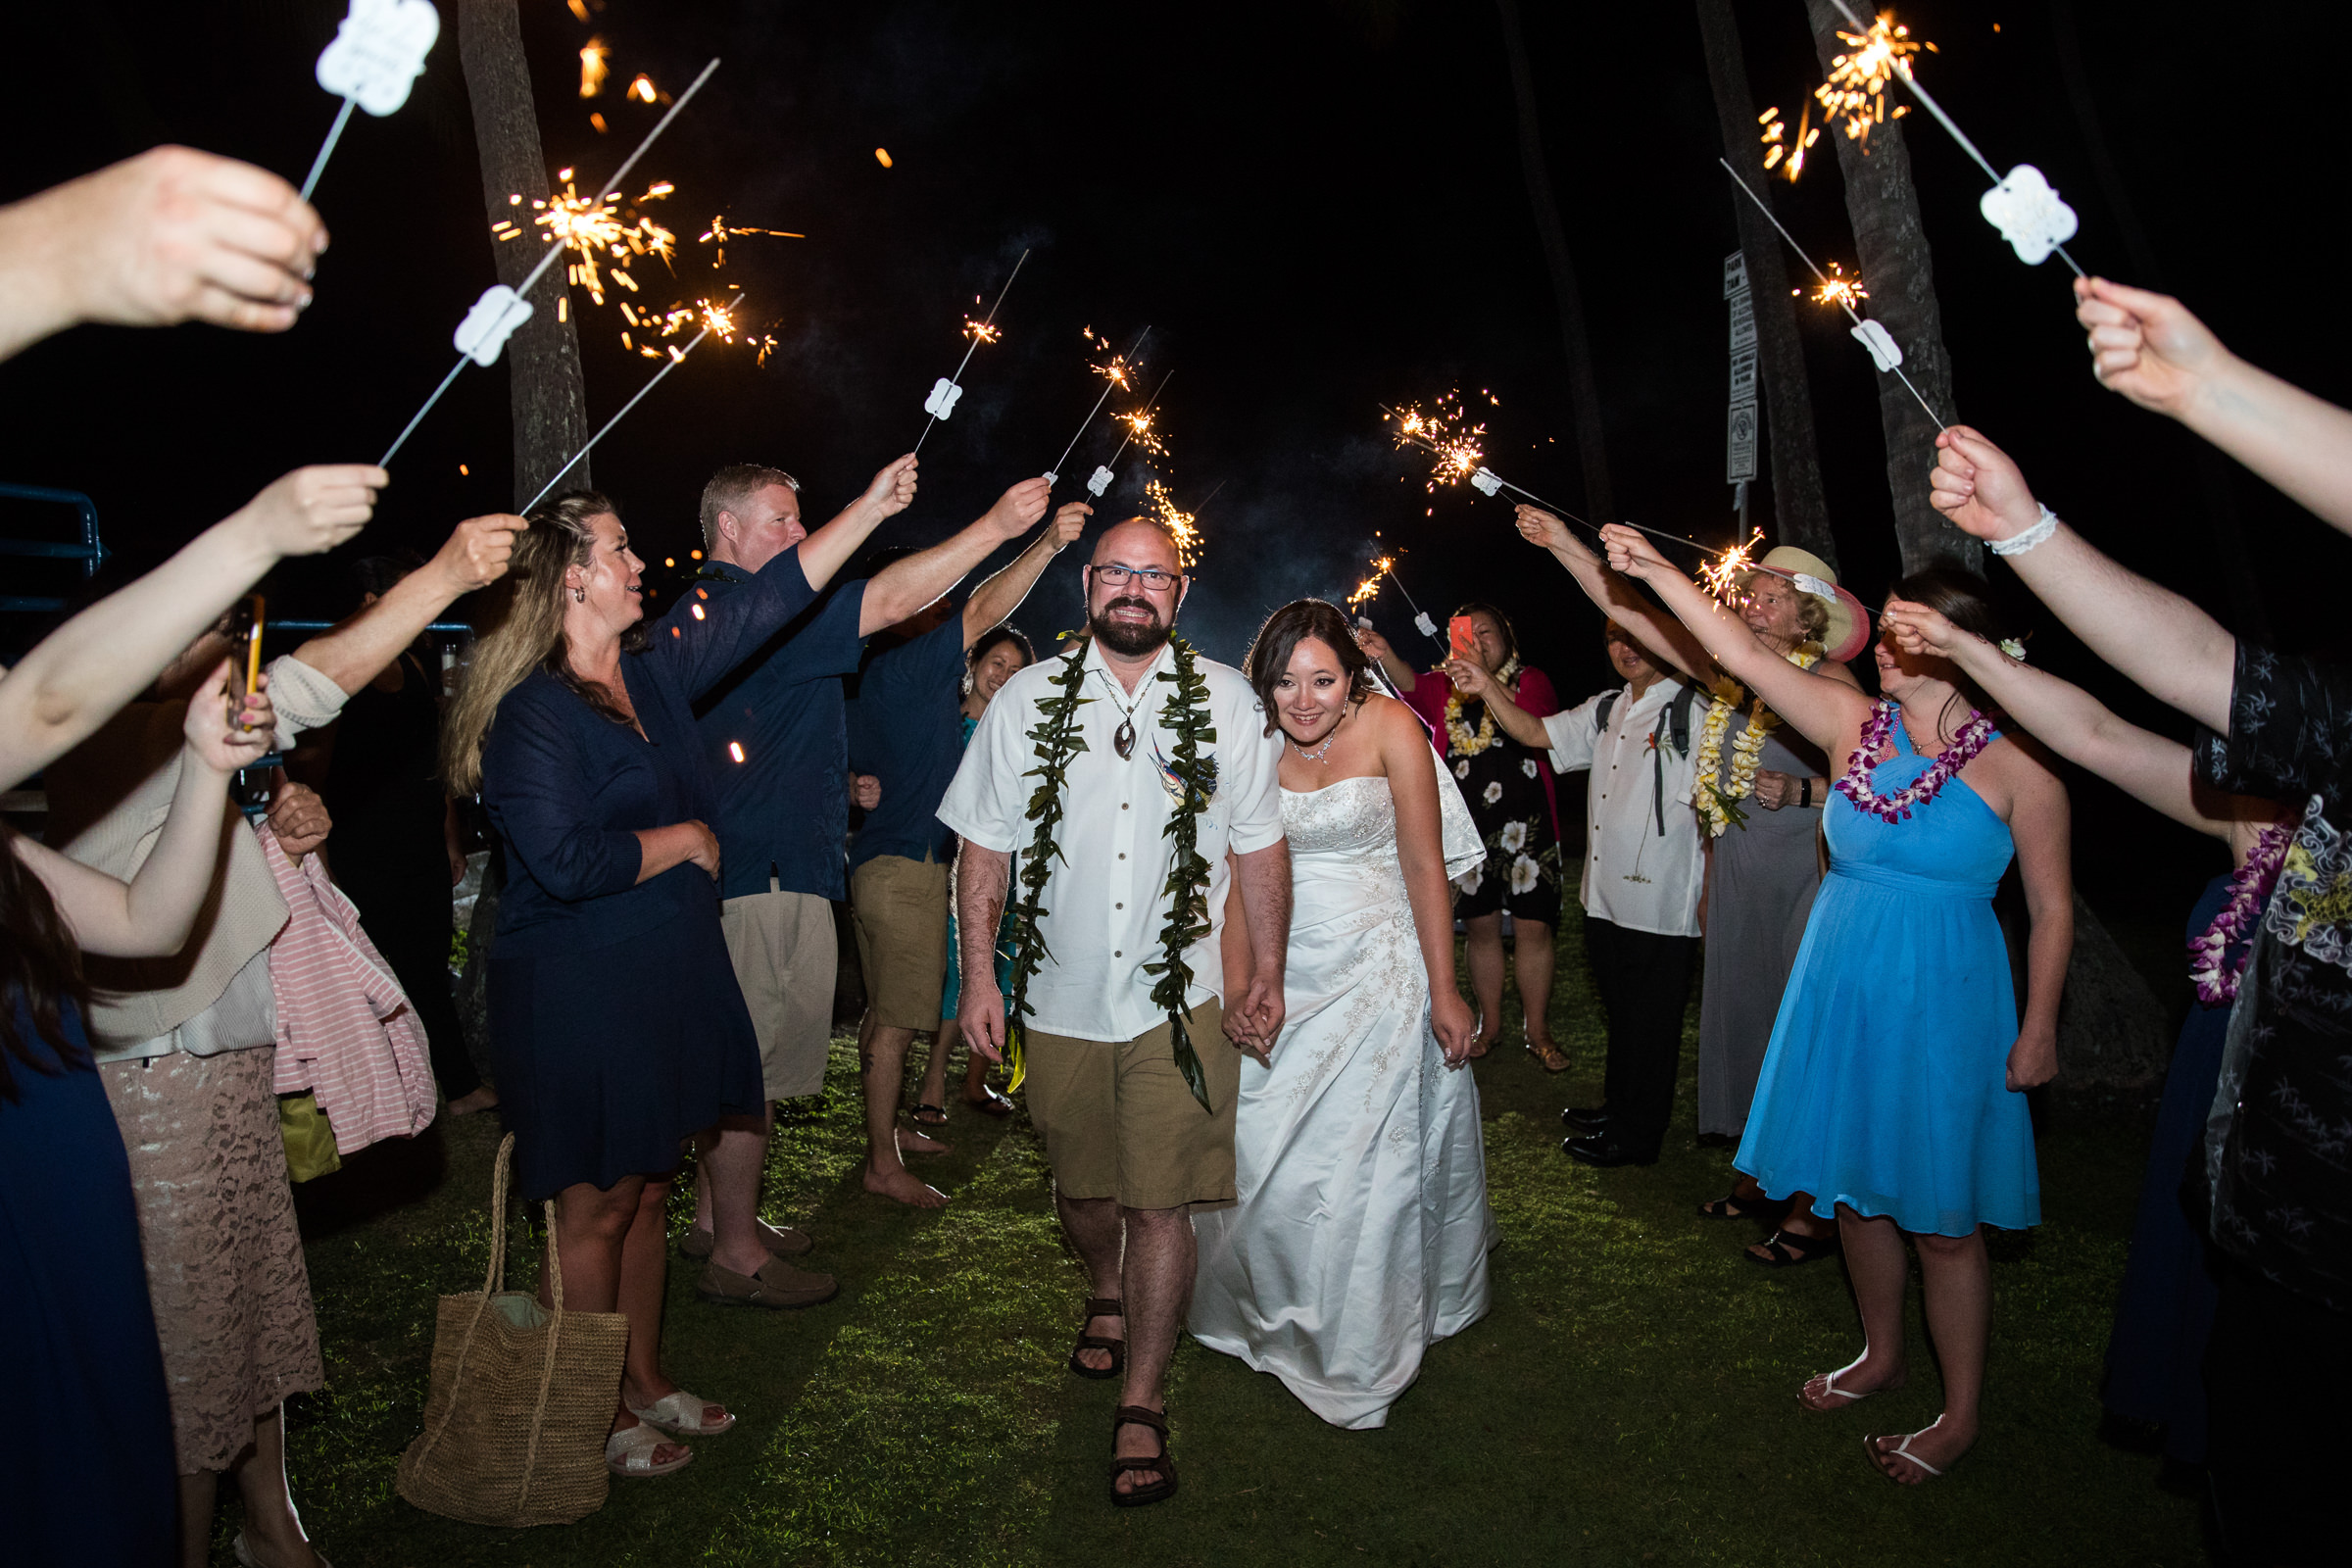 wedding-photographer-photography-destination-hawaii-lake-tahoe-reception-sparkler-exit